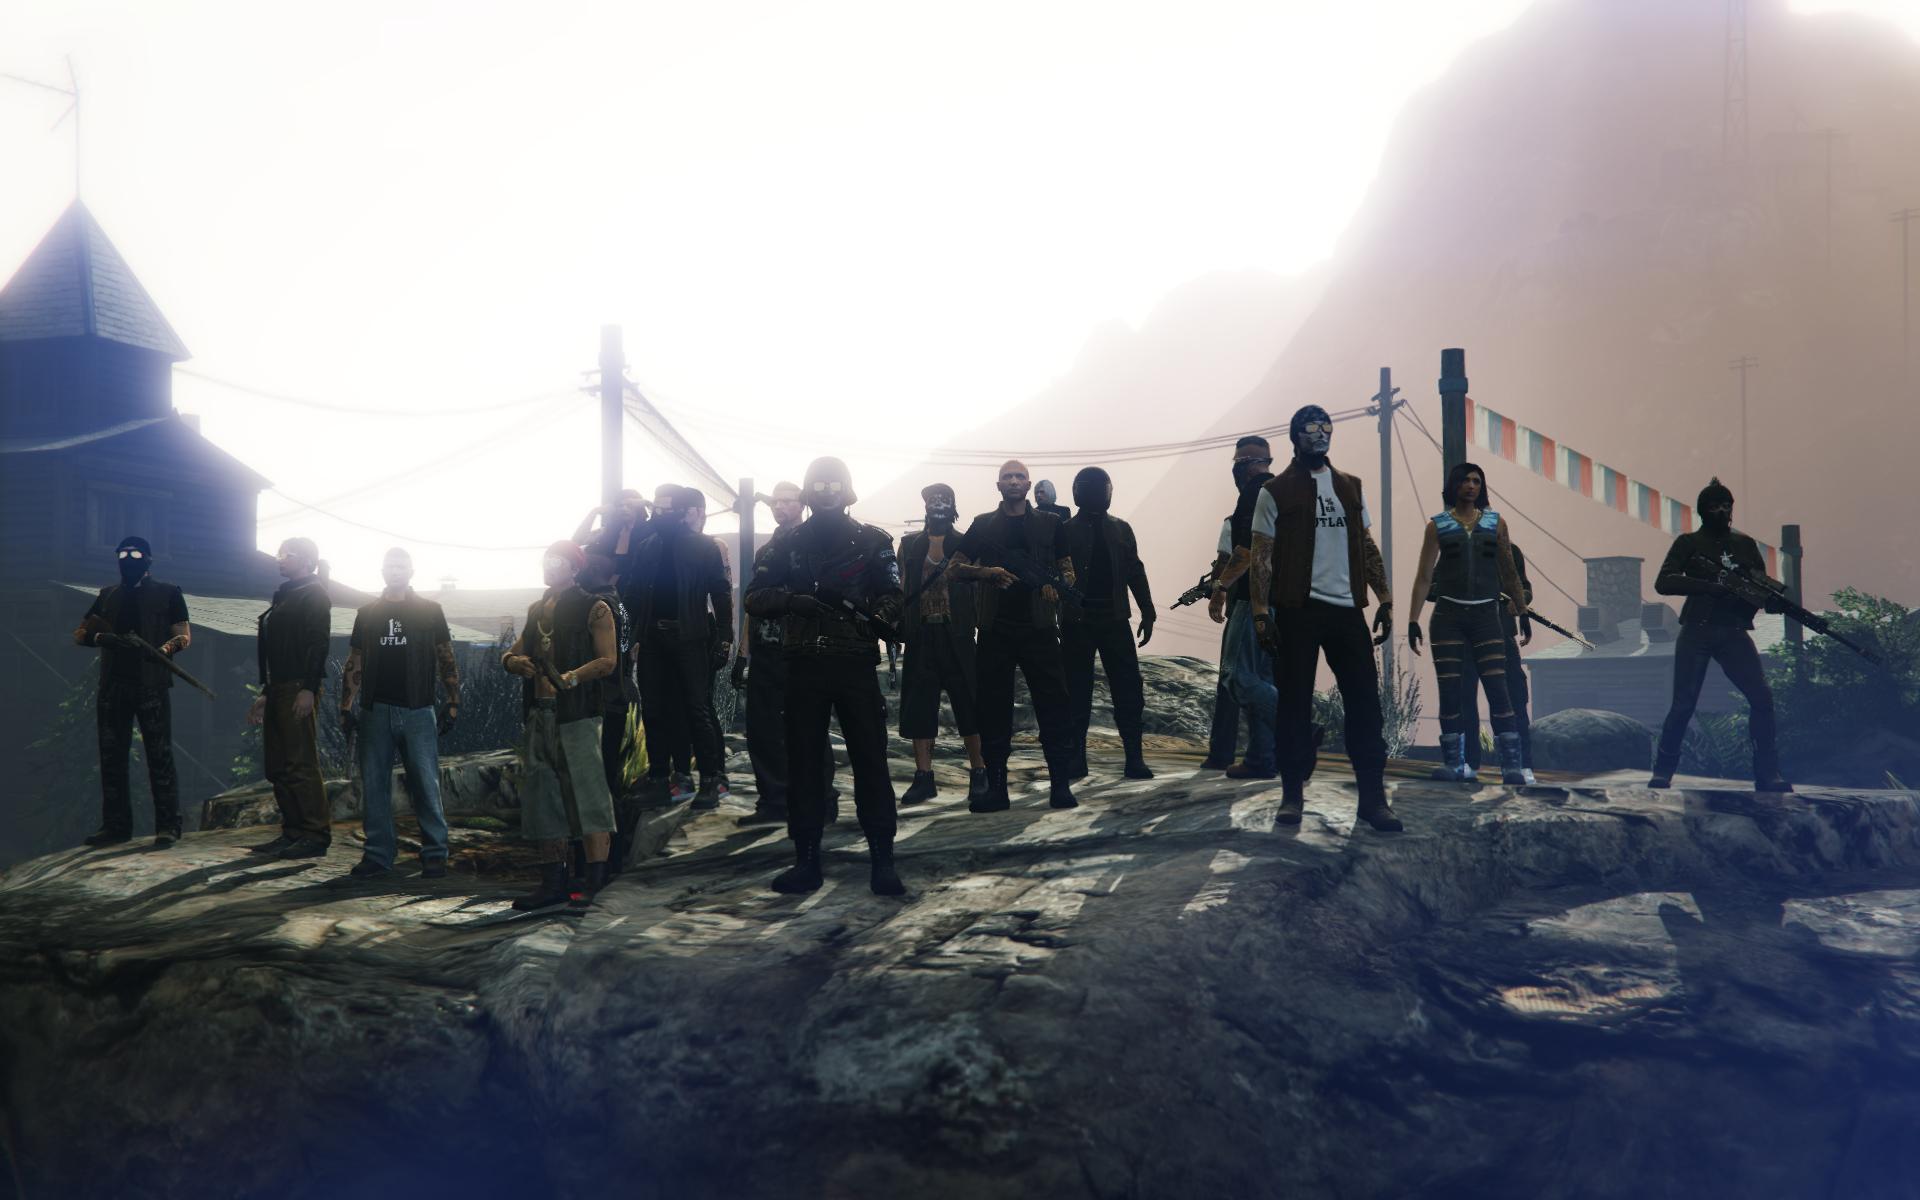 Grand_Theft_Auto_V_Screenshot_2020.03.26_-_19.02.52.51.png